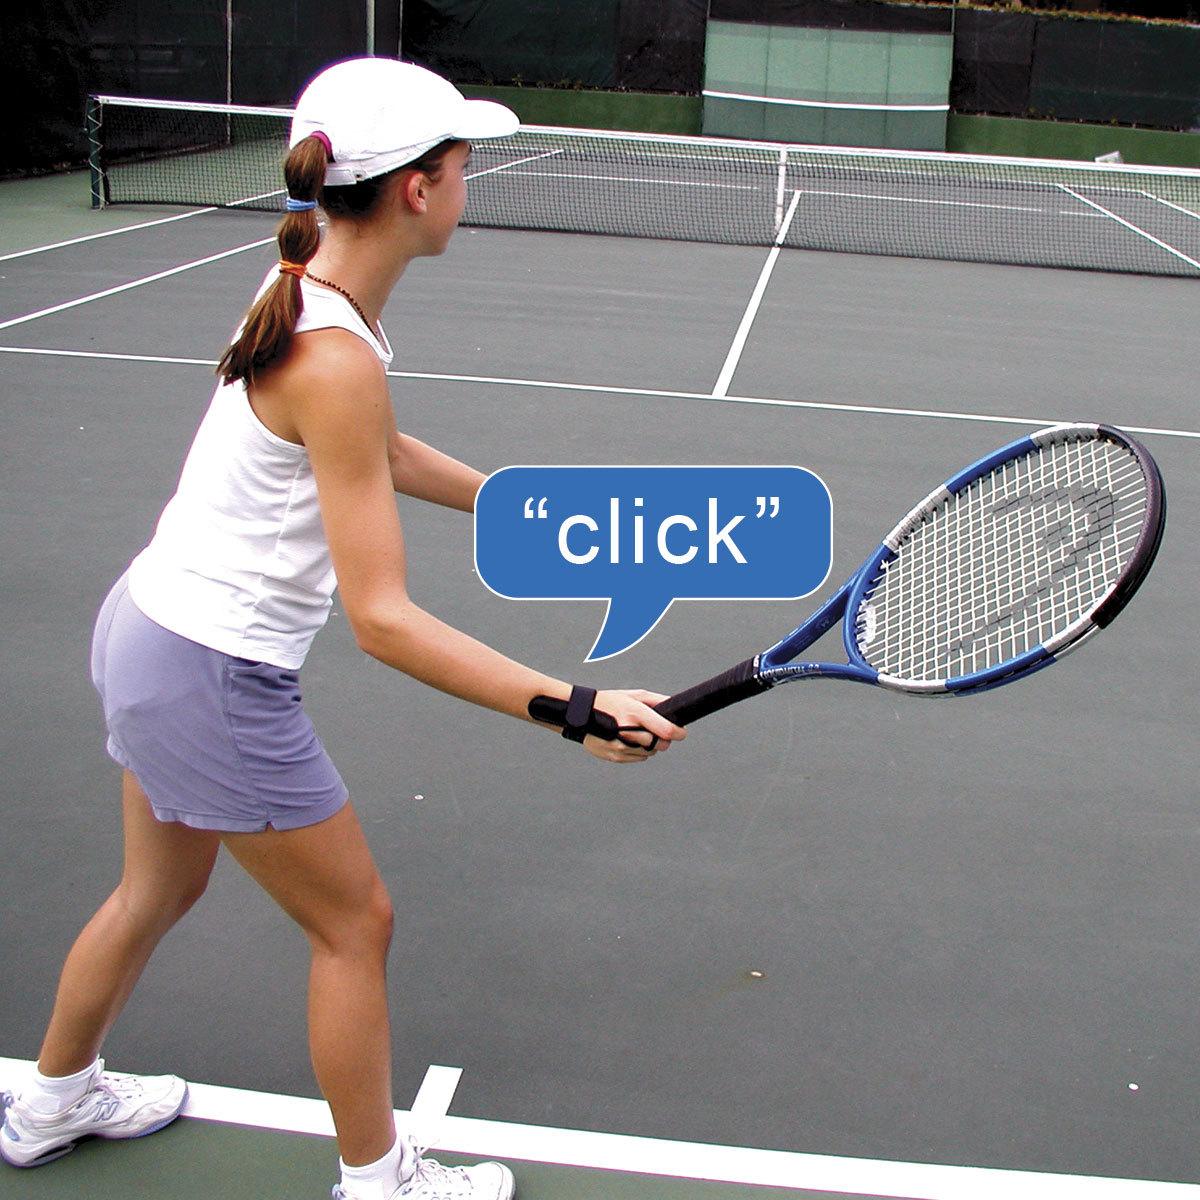 Тренажер для тренировки техники удара Tac-Tic Wrist Trainer